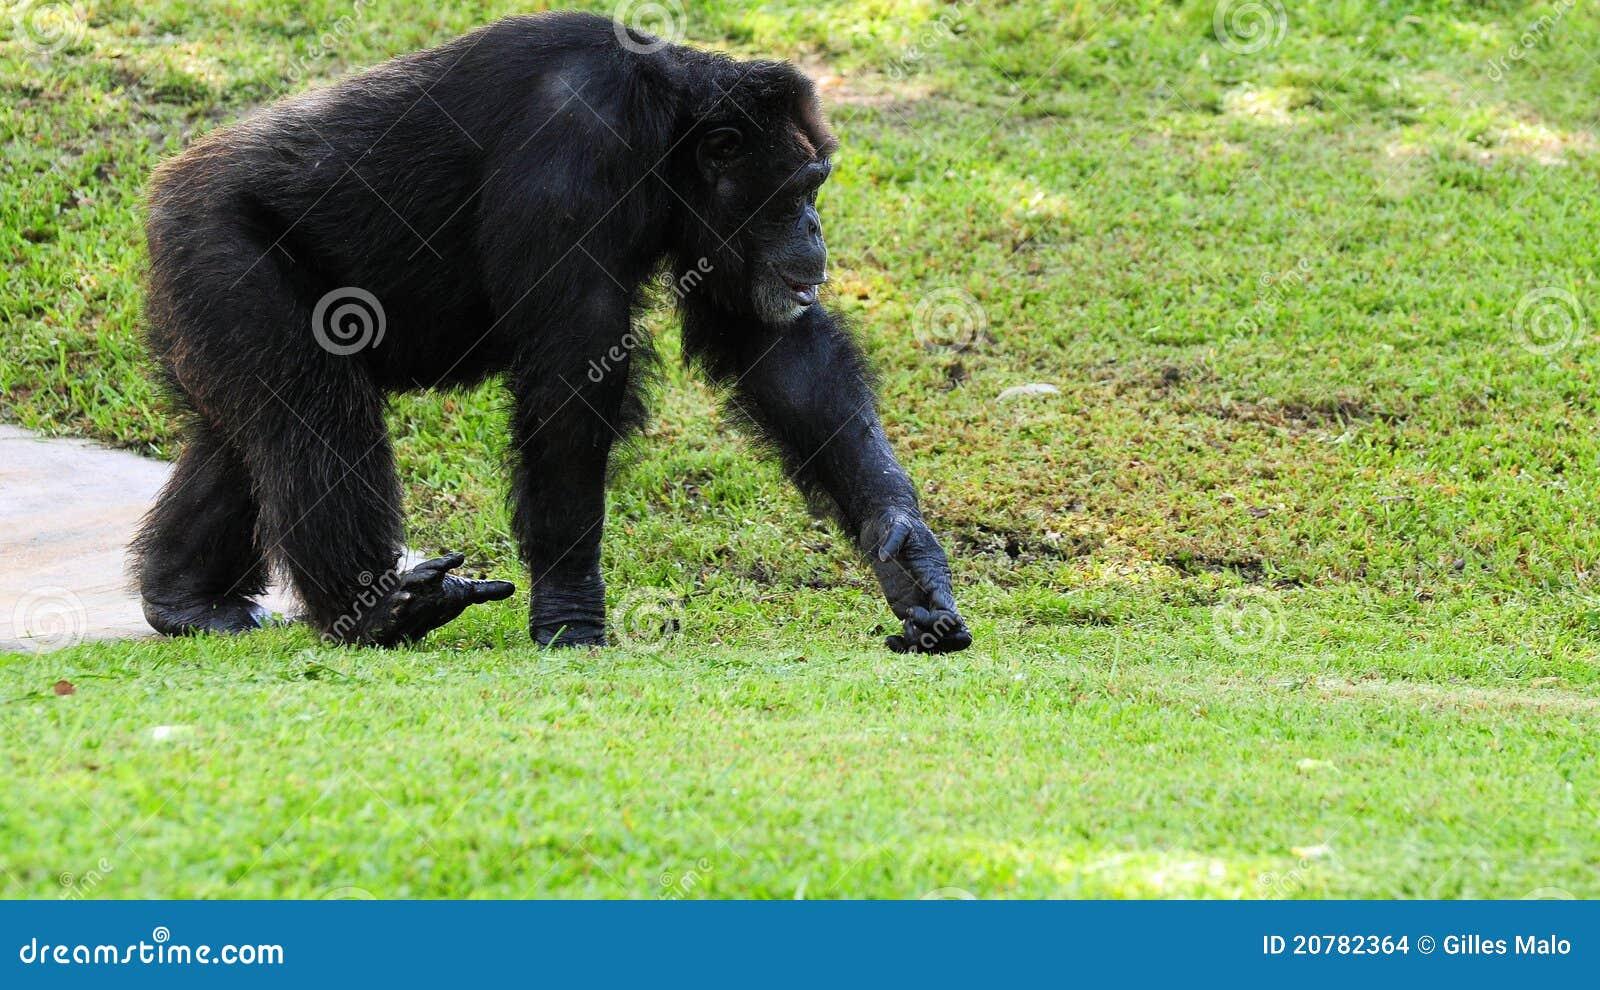 Chimpanzee Happy | www.imgkid.com - The Image Kid Has It!